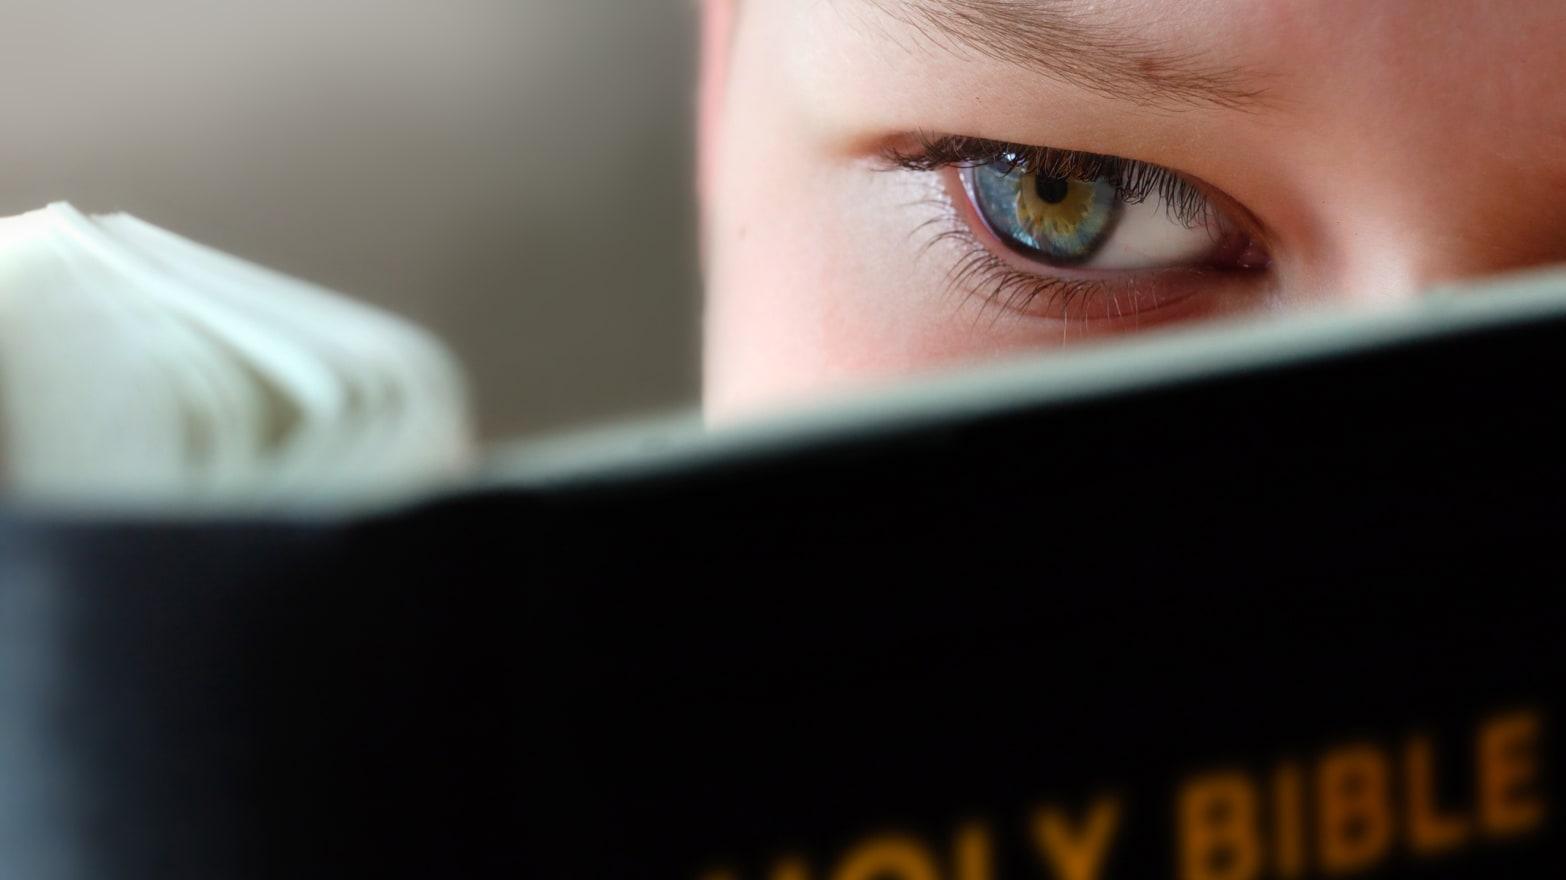 Can Christians Still Go To Harvard